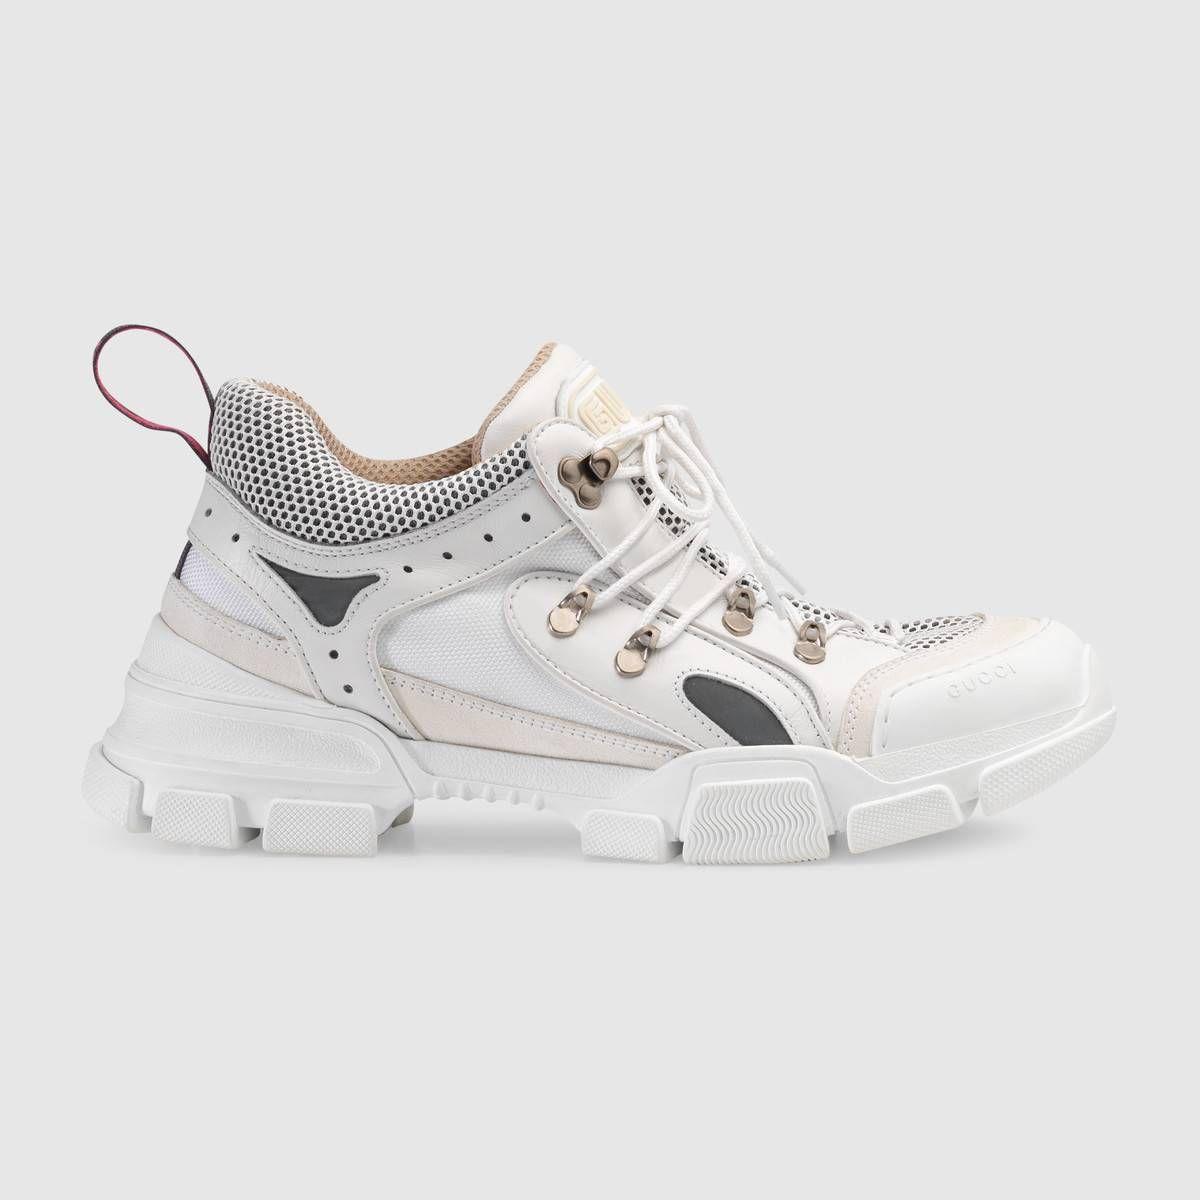 5aedbe5ab10 Flashtrek sneaker Dad Shoes